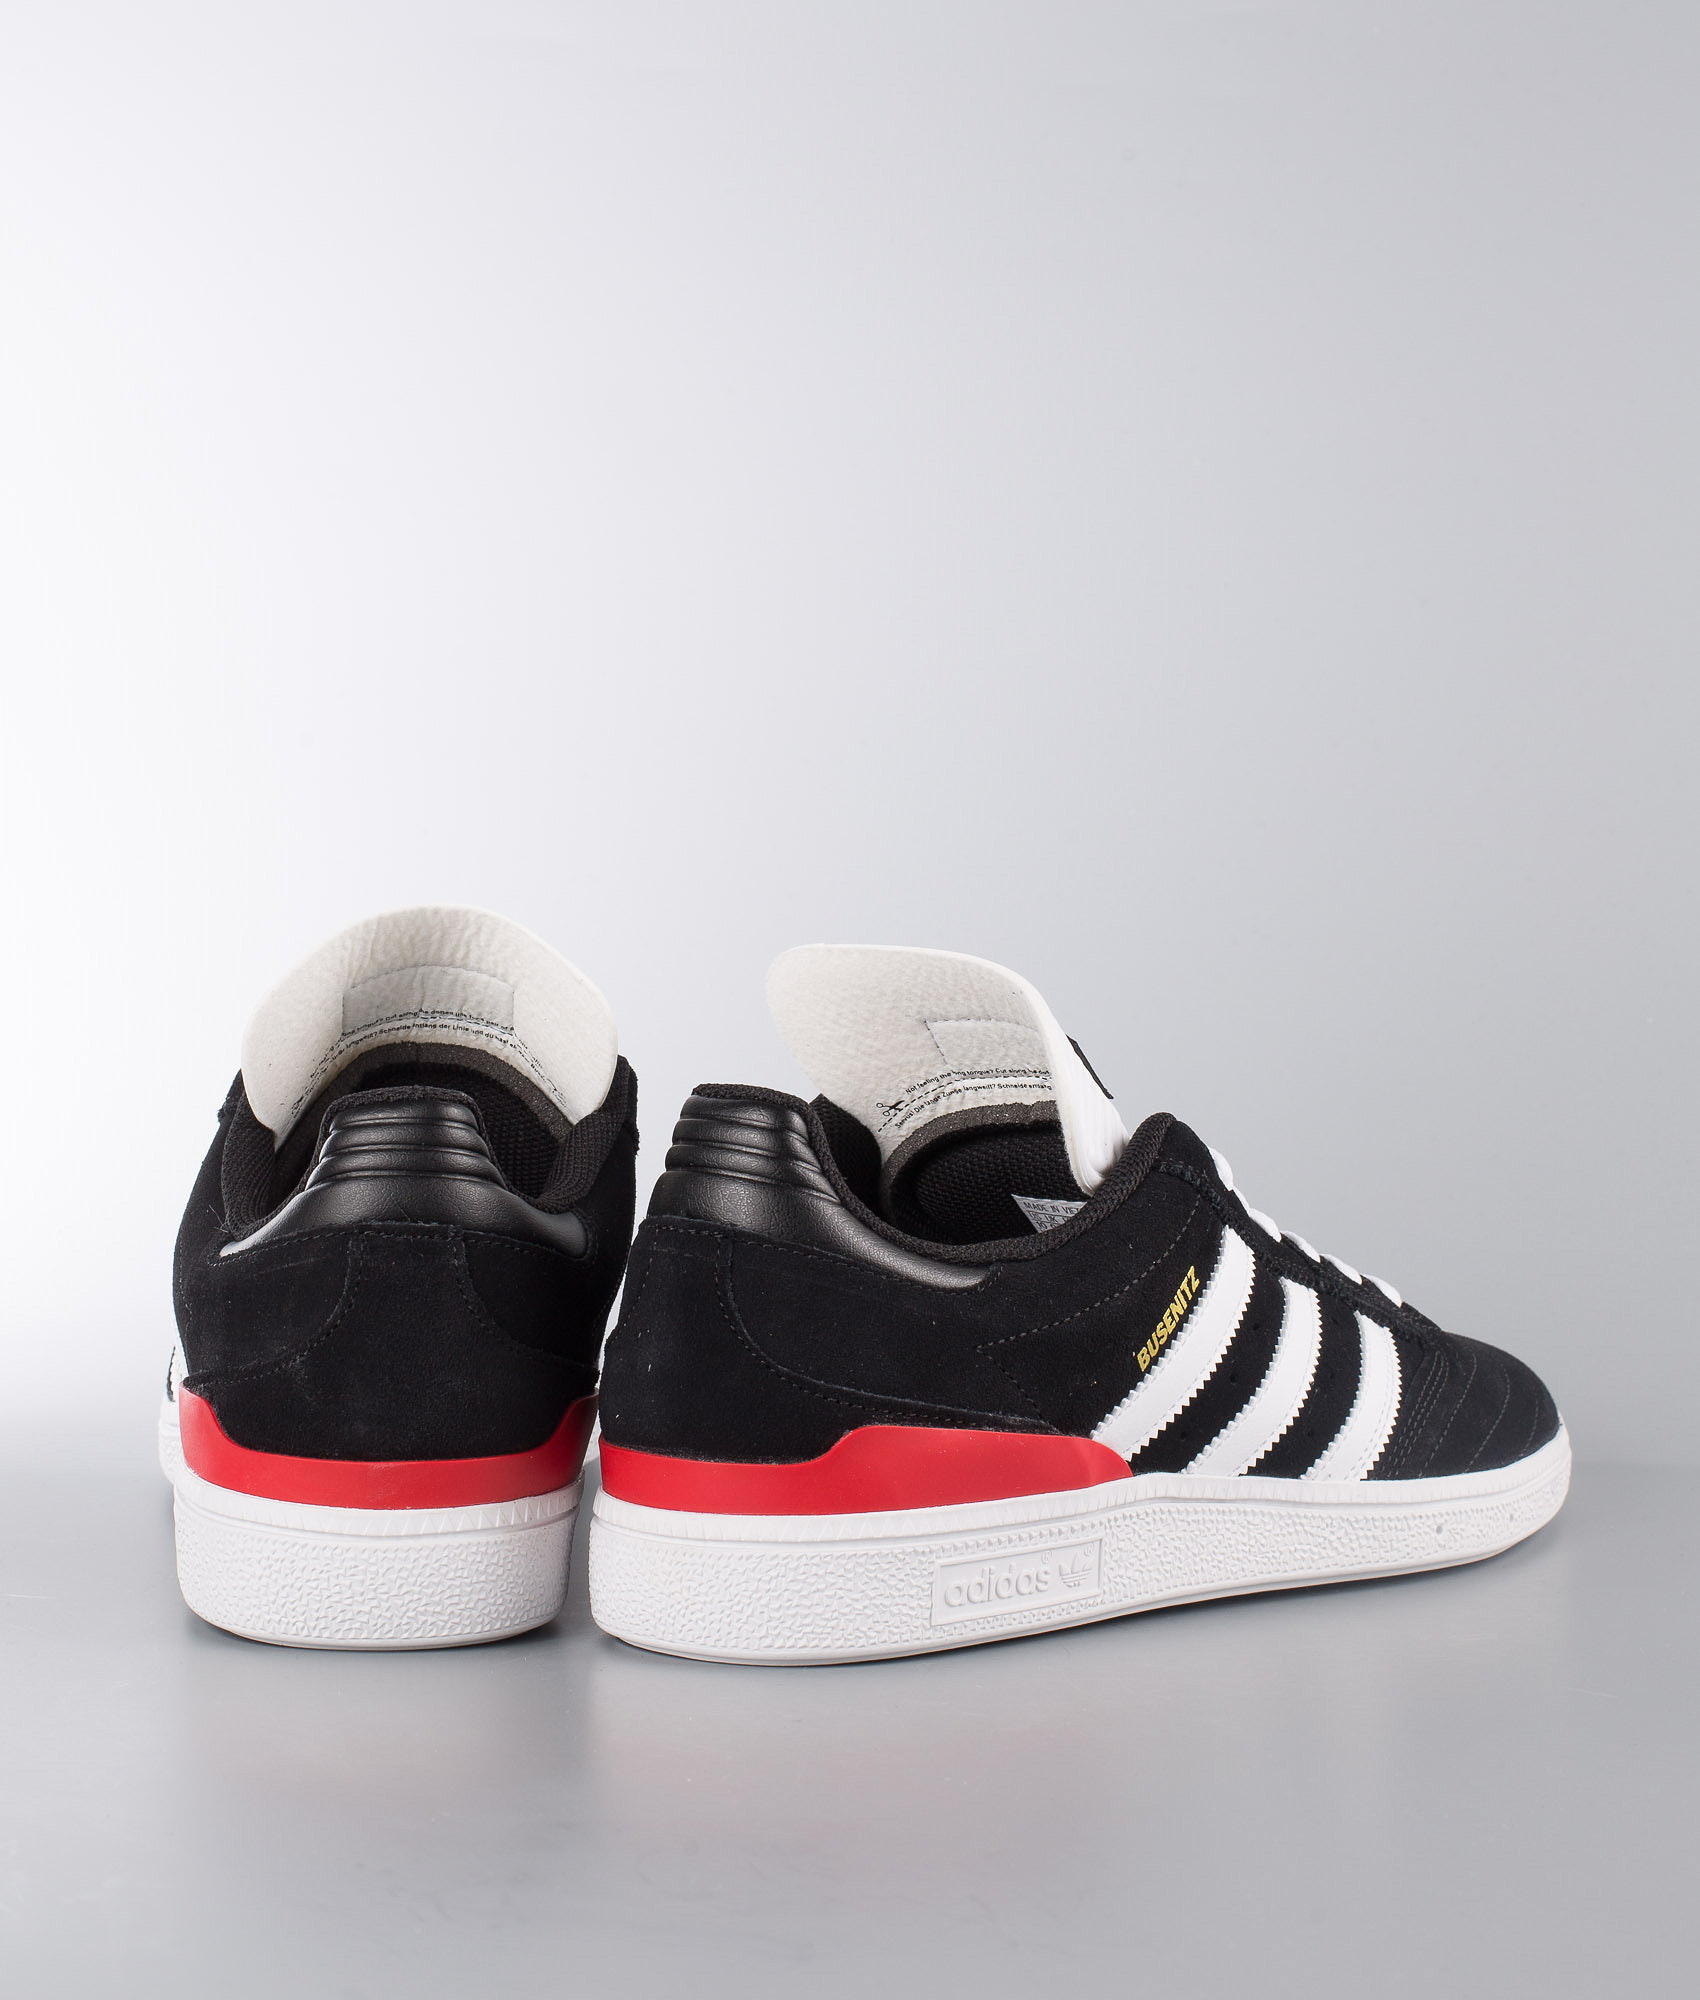 new product 49d31 0d58d Adidas Skateboarding Busenitz Scarpe